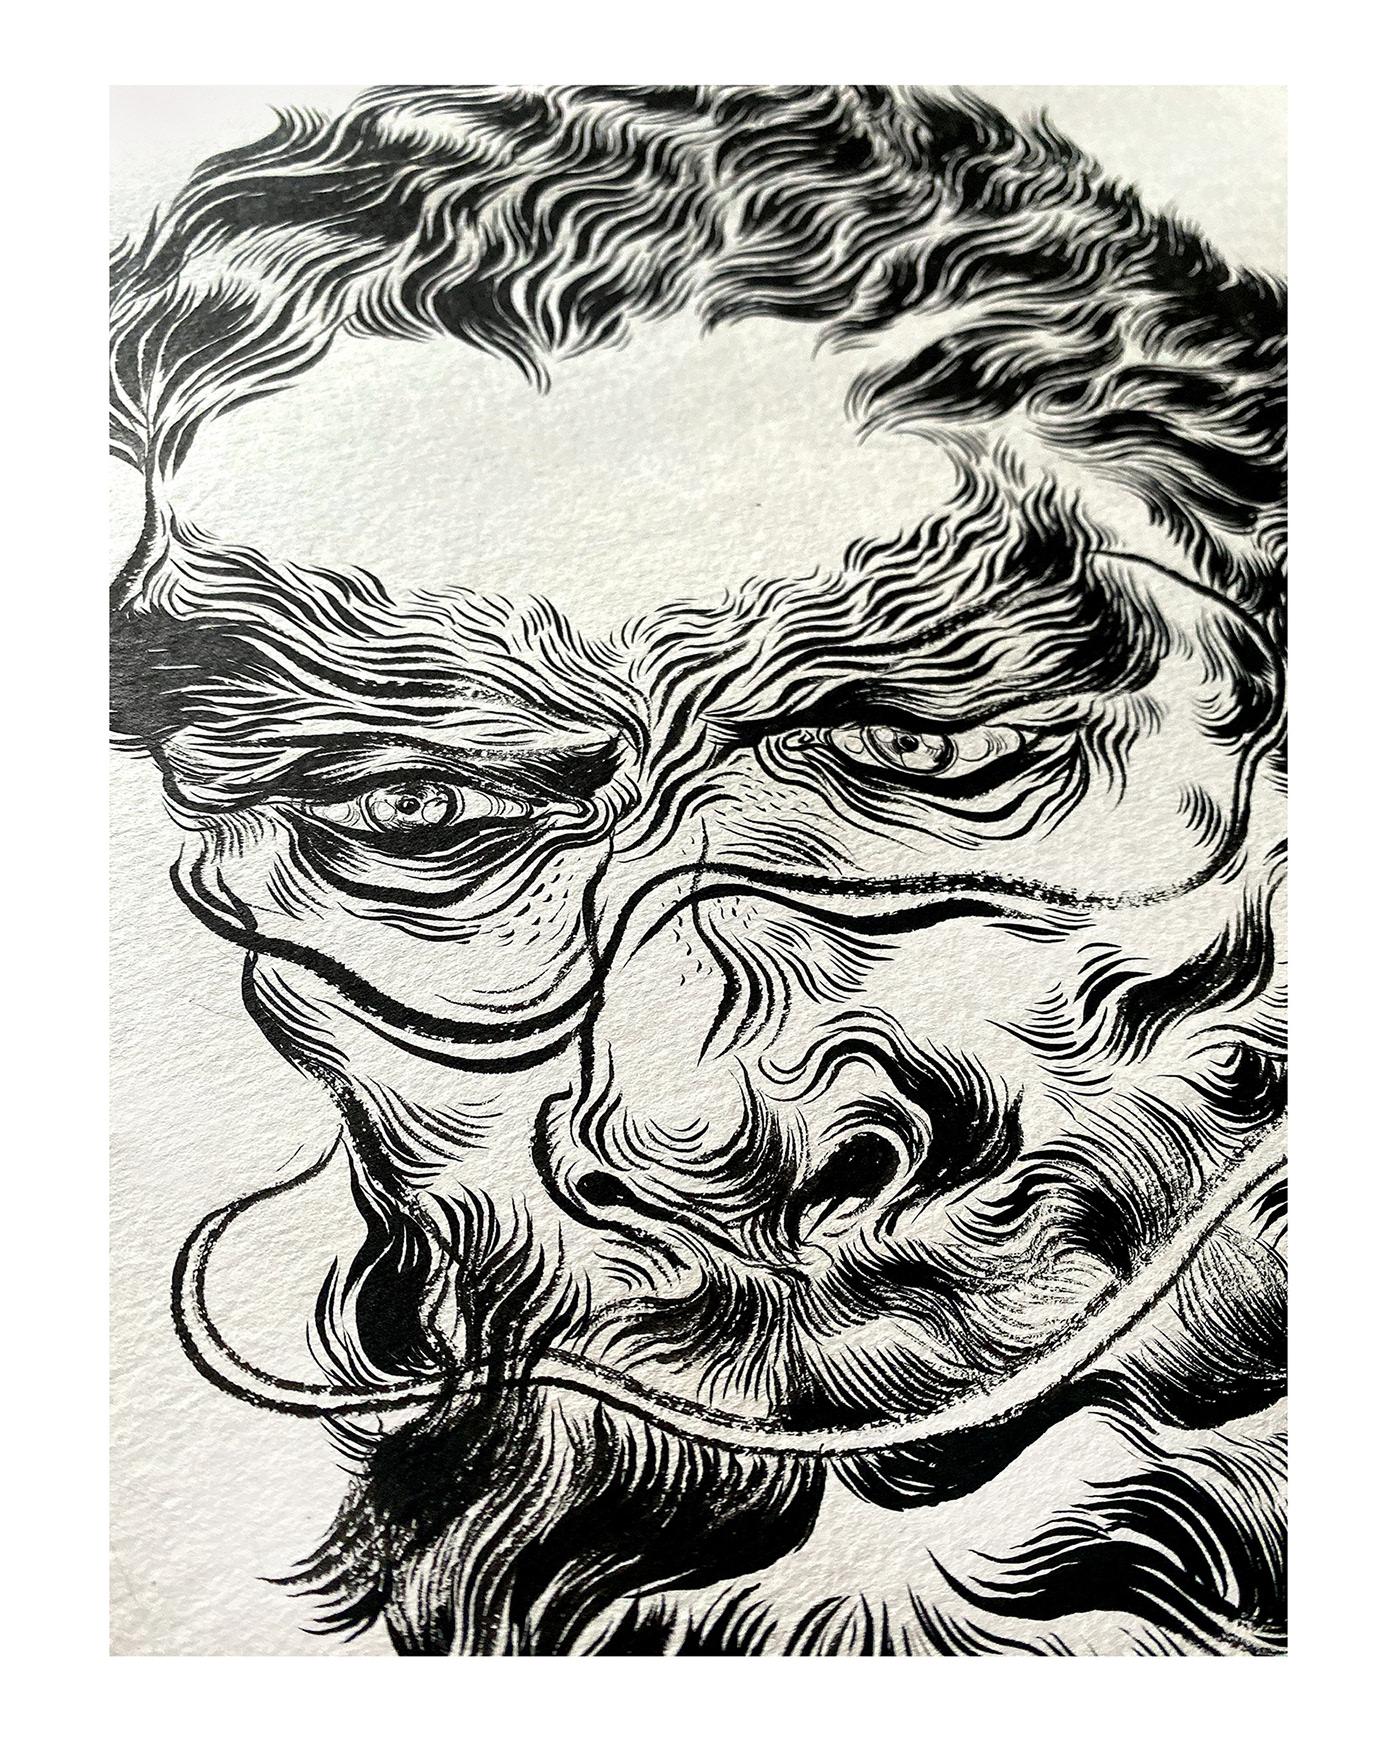 art artwork brushpenart brushstrokes Drawing  handdrawn ILLUSTRATION